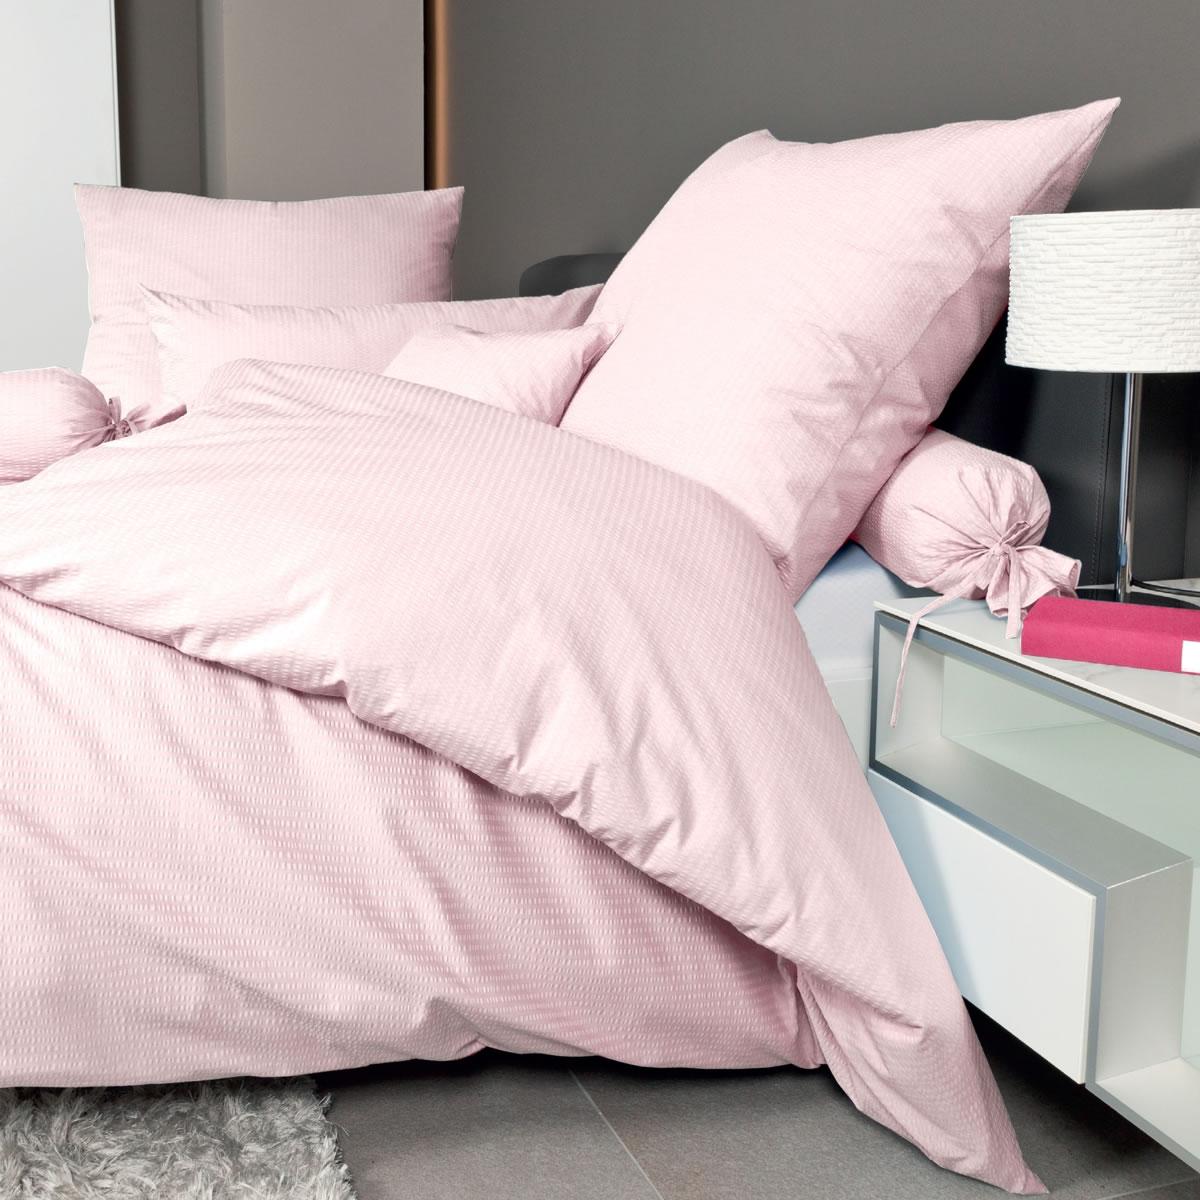 janine uni mako soft seersucker bettw sche 0125 piano. Black Bedroom Furniture Sets. Home Design Ideas